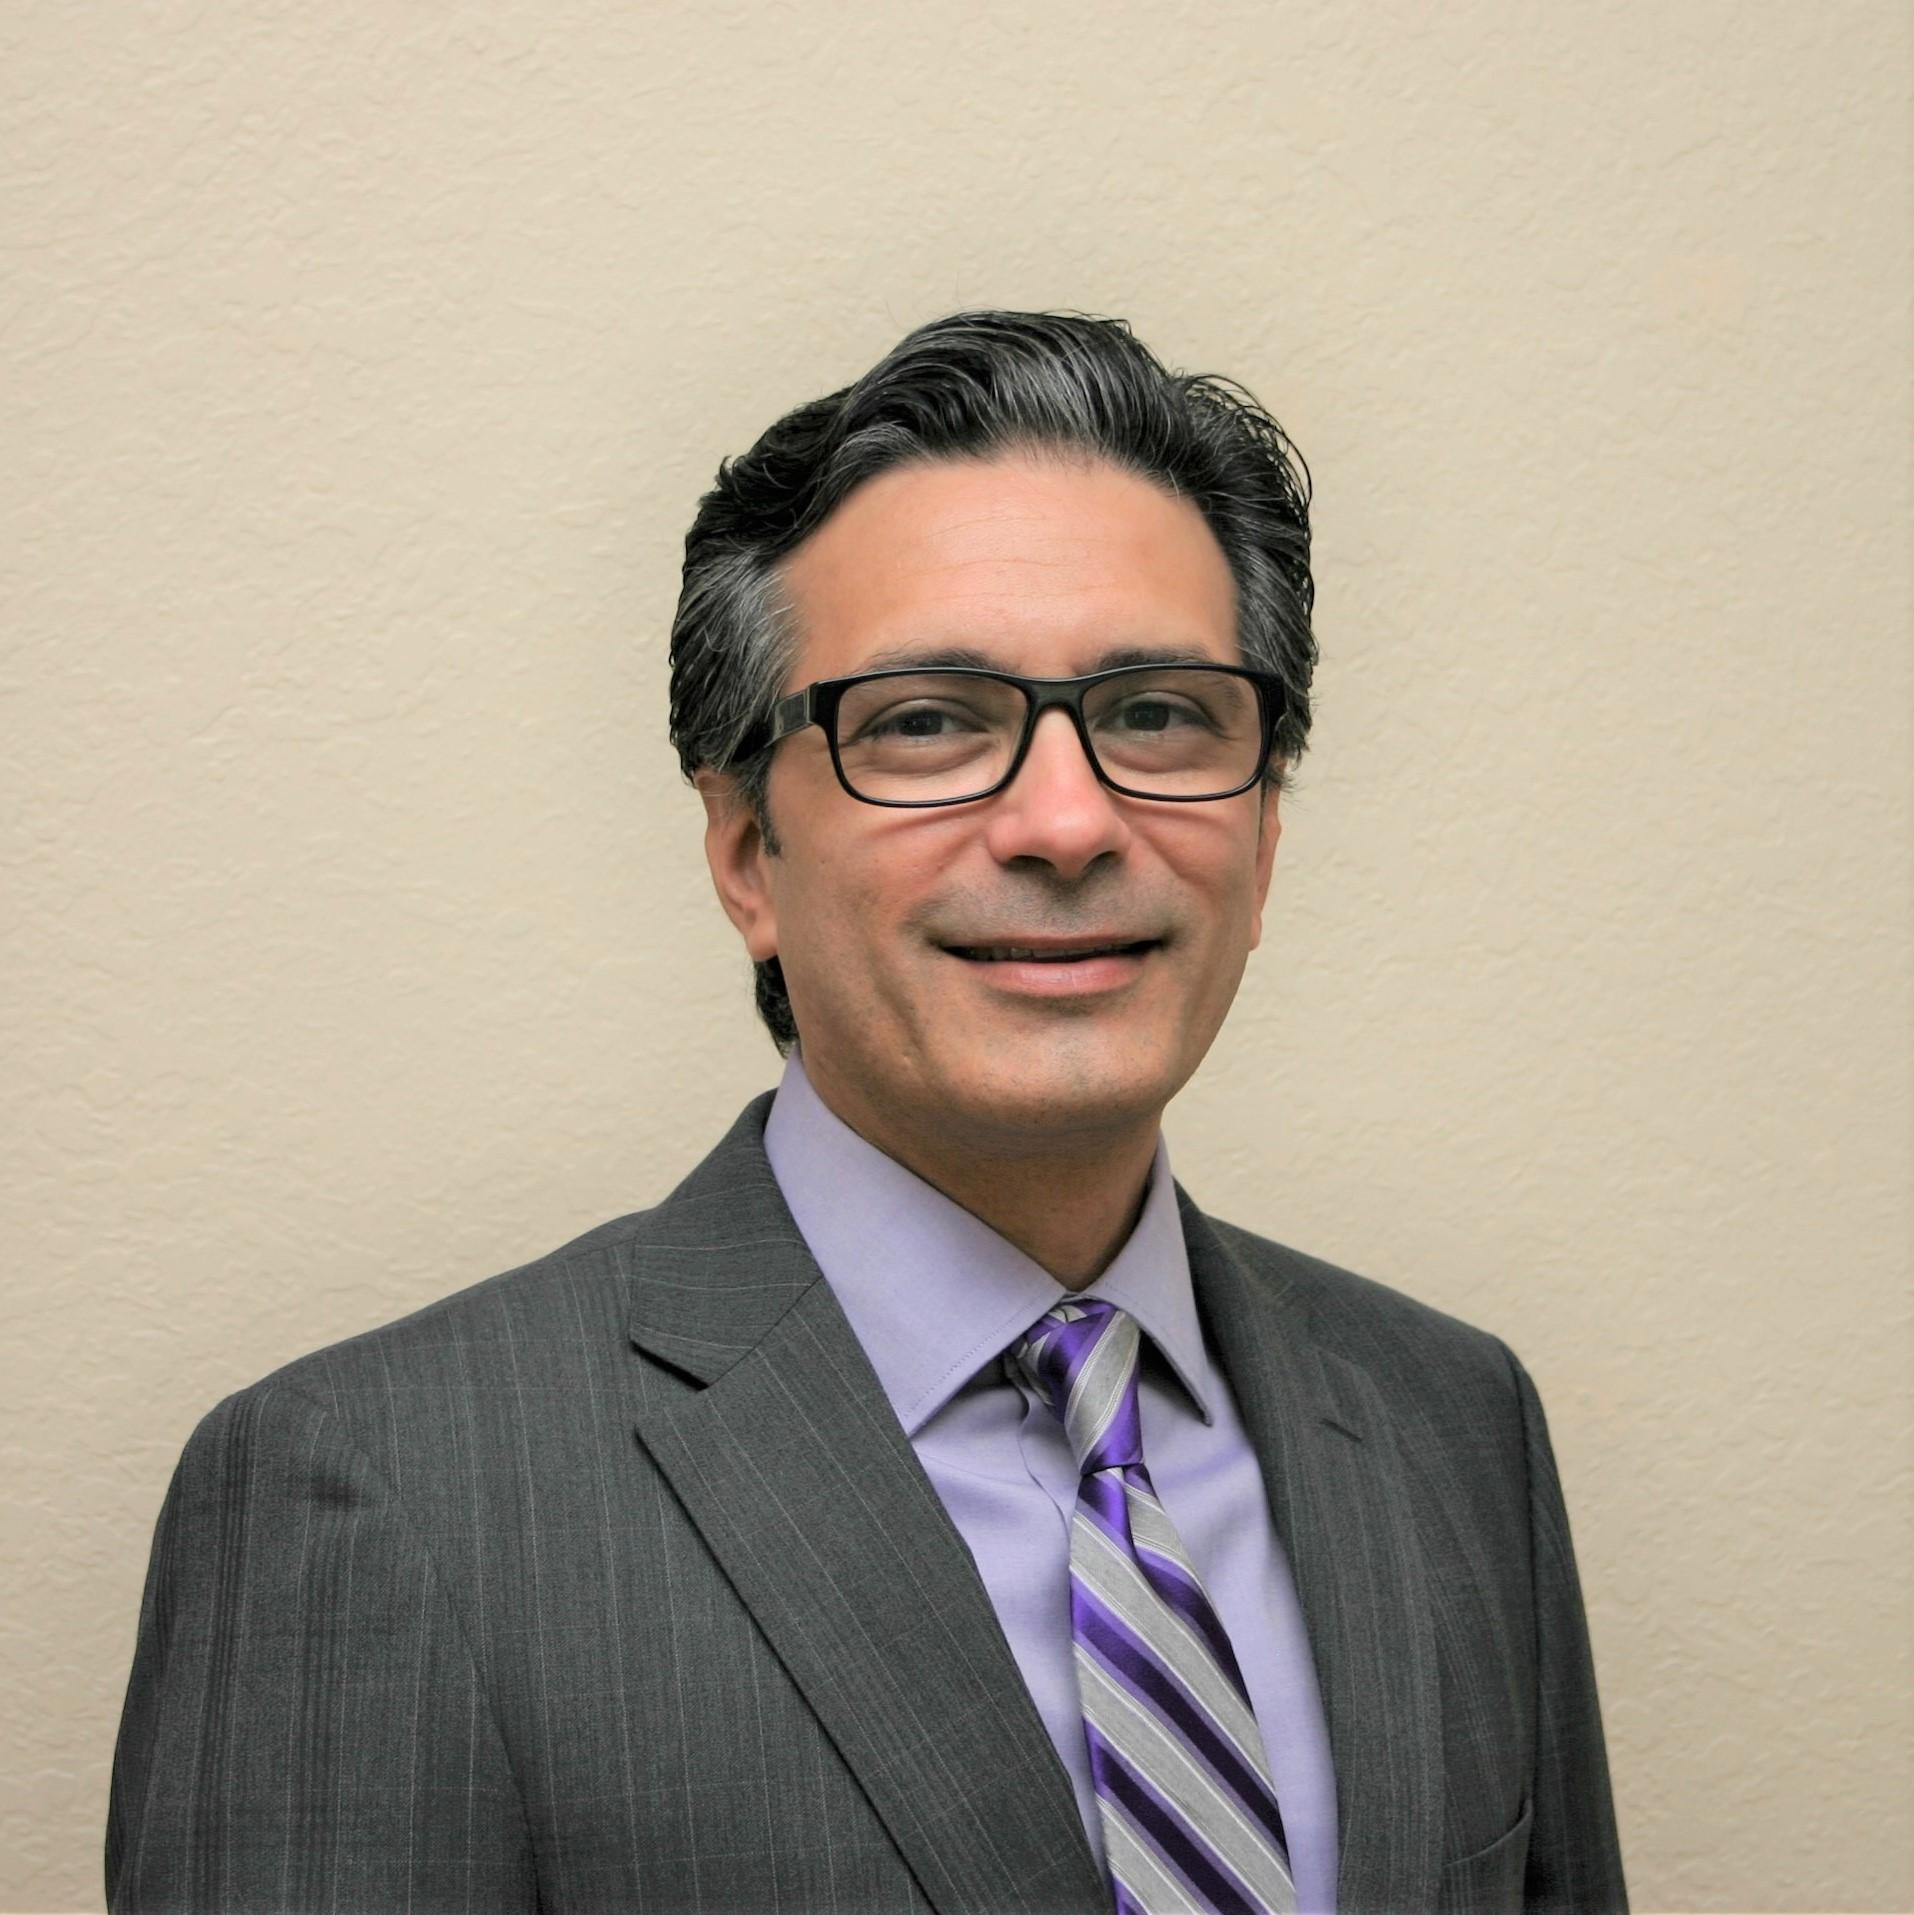 Dr. Michael Valle, OD